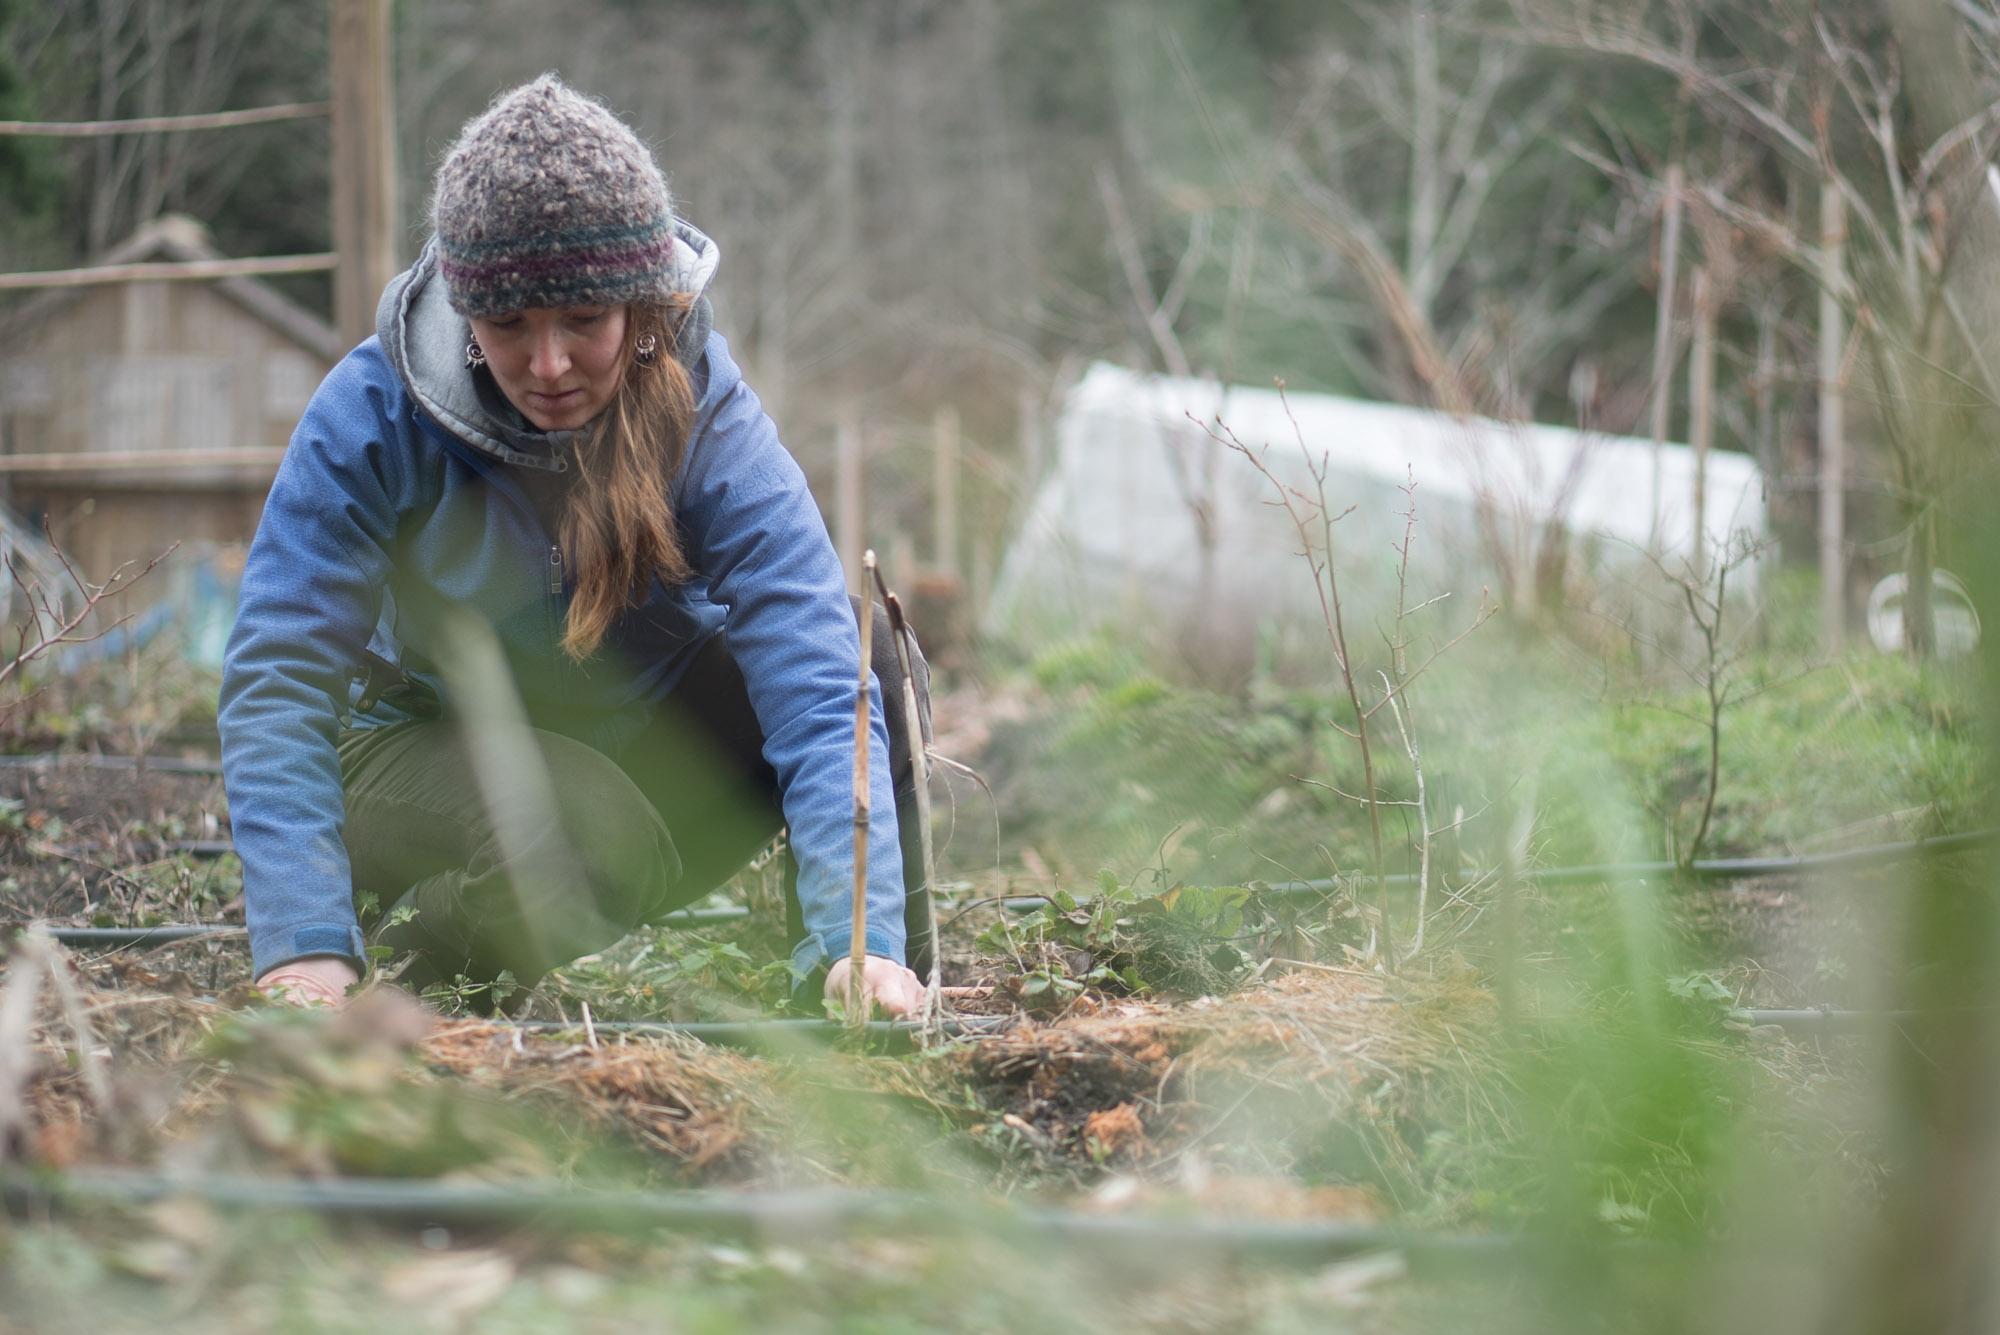 women-who-farm-over-grow-the-system-13.jpg